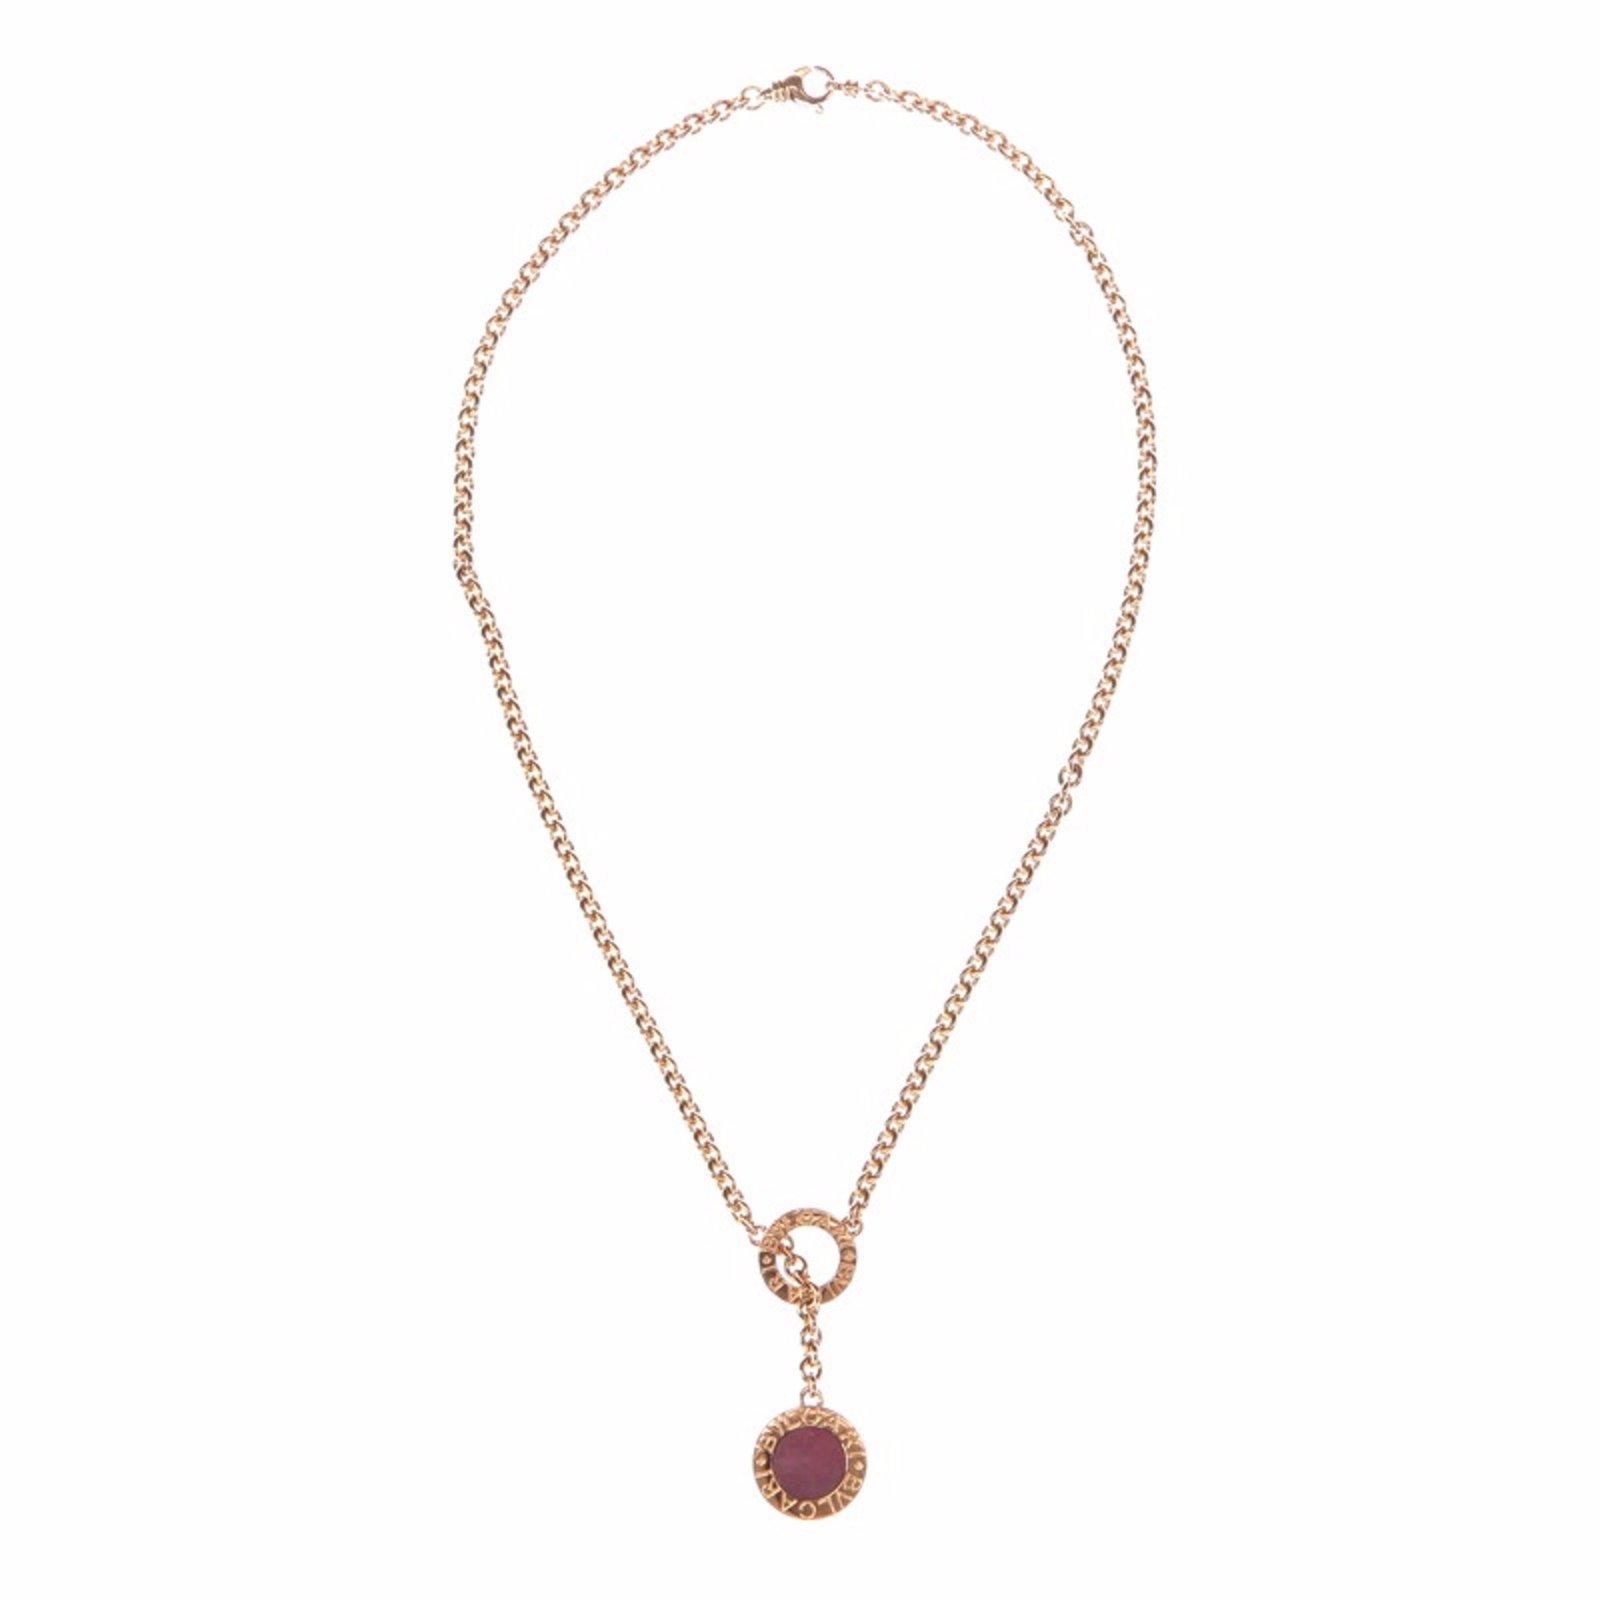 bulgari bvlgari 18k gold lapis coral necklace necklaces gold golden ref35349